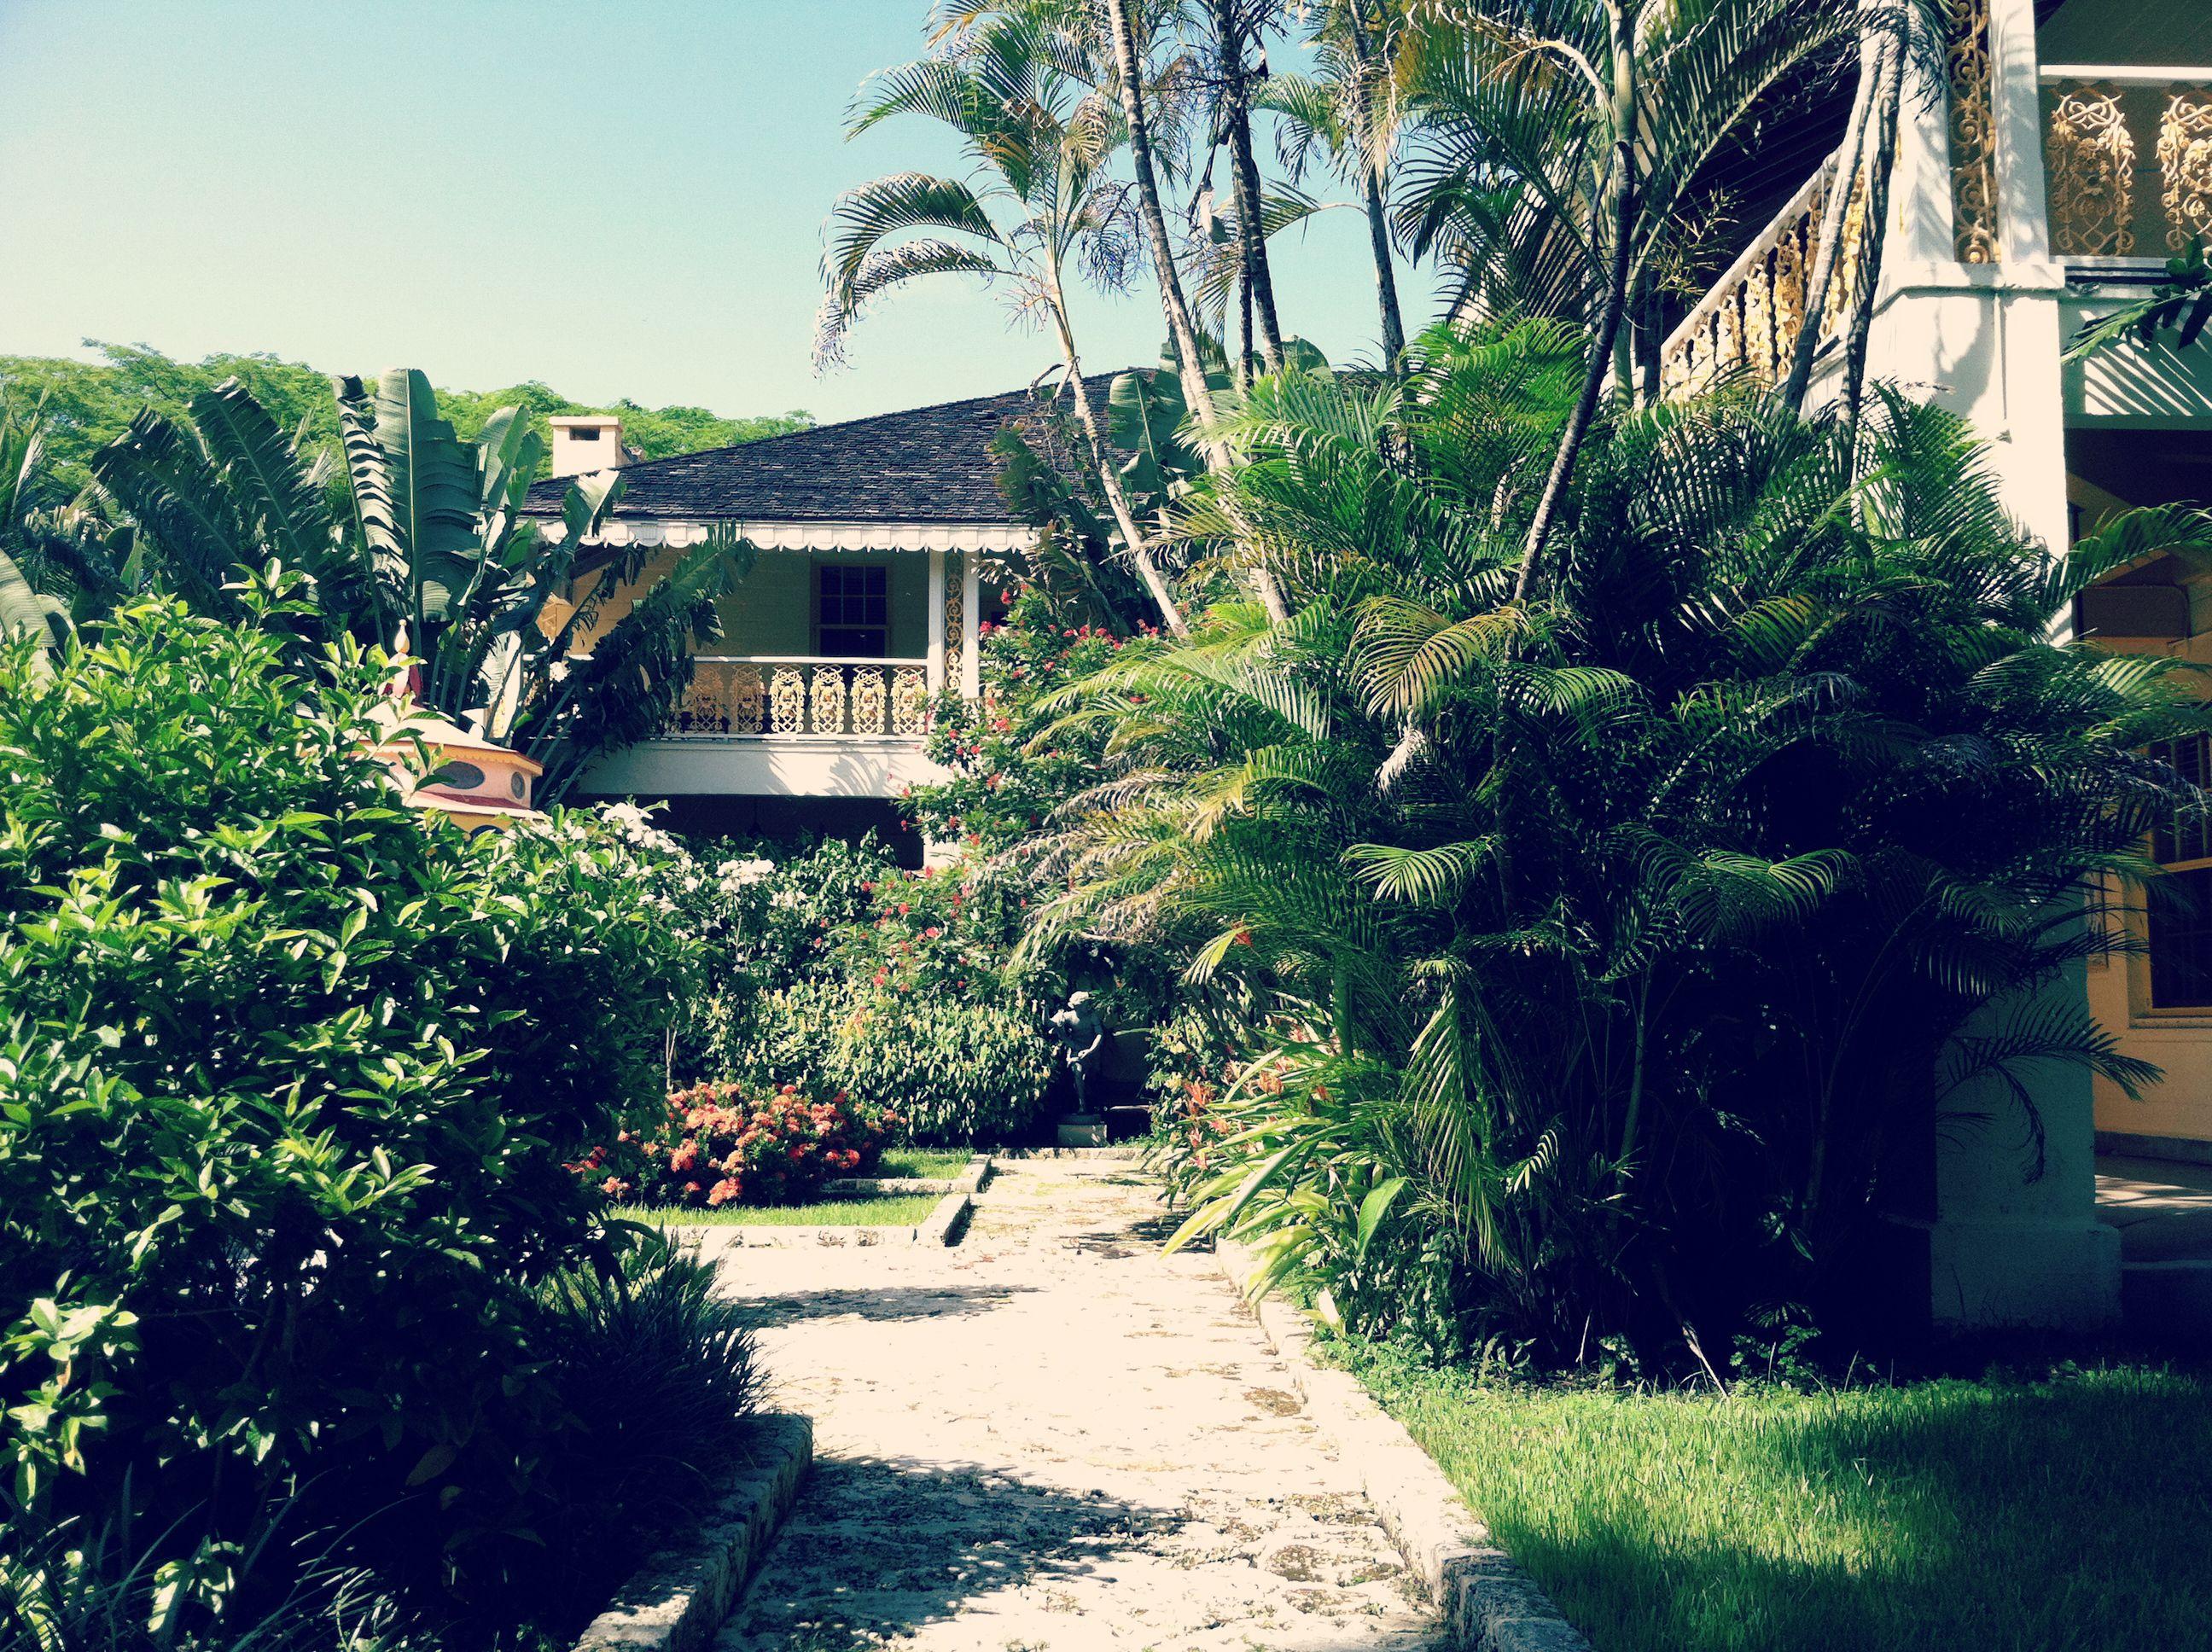 Bonnet House Museum & Gardens (via Of Sand & Snow | www.sandsnowblog ...